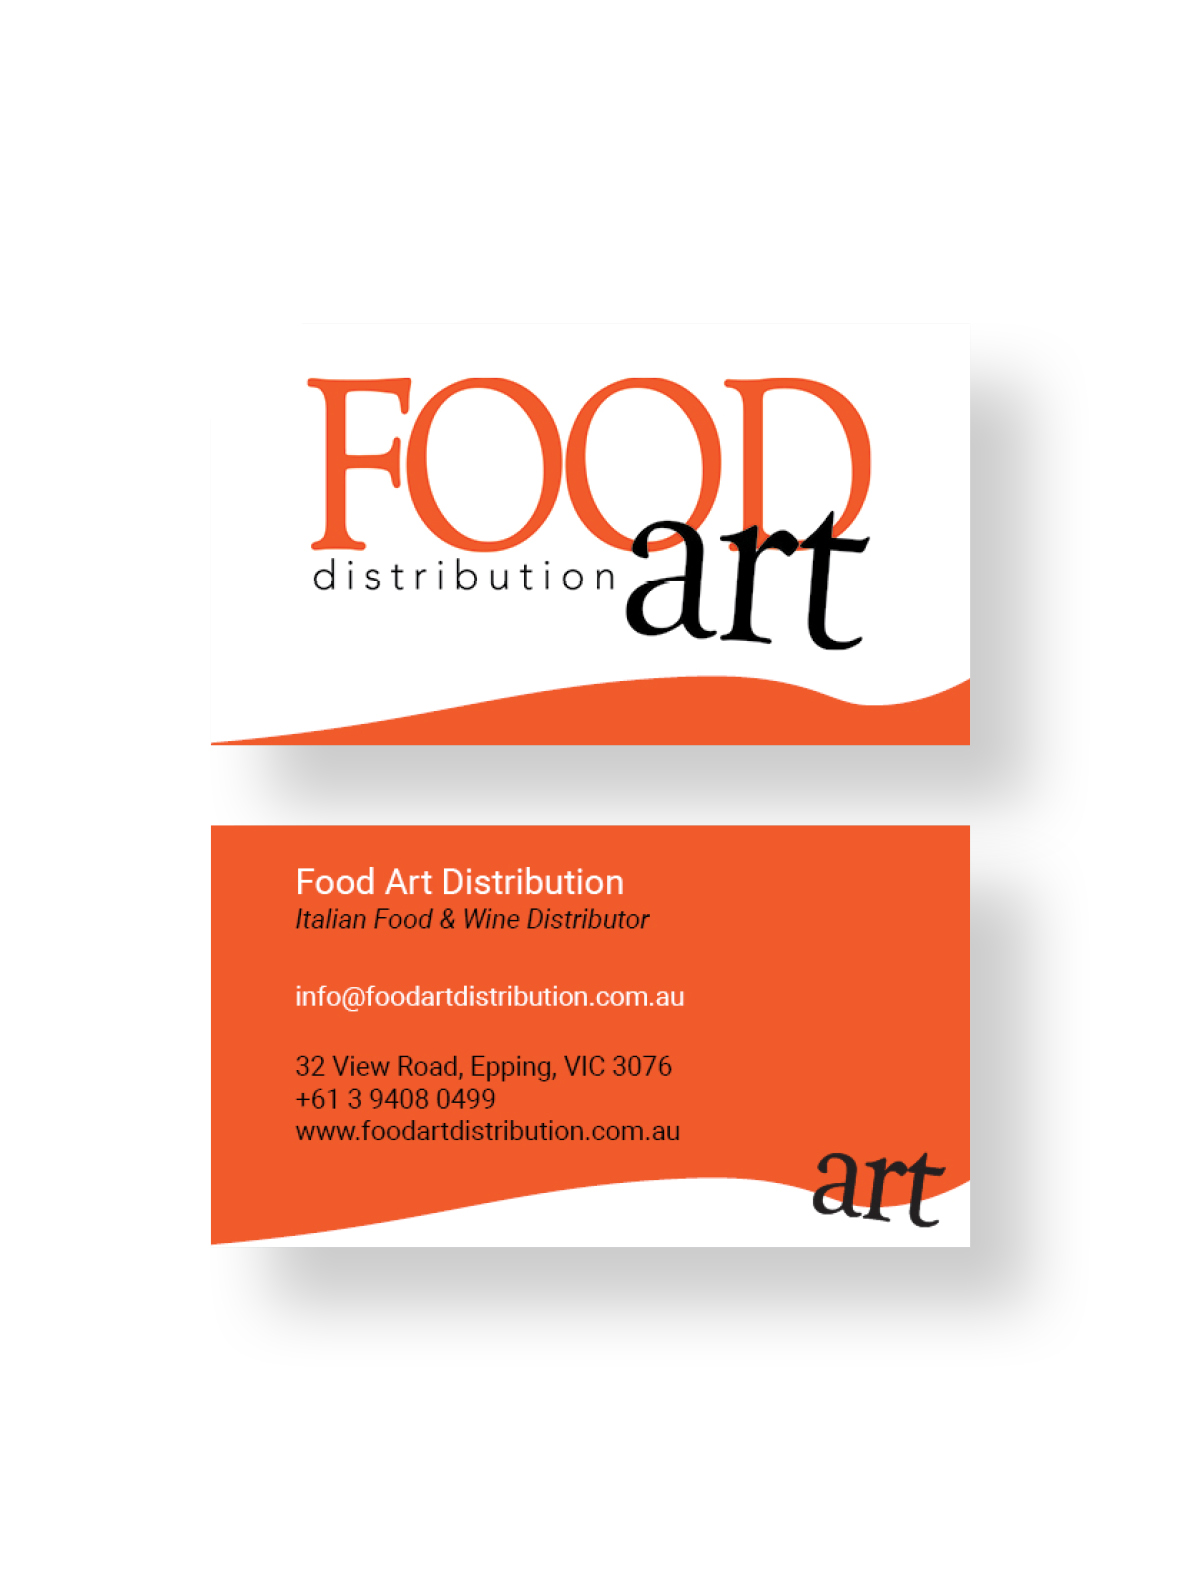 Portfolio - Vital Marketing